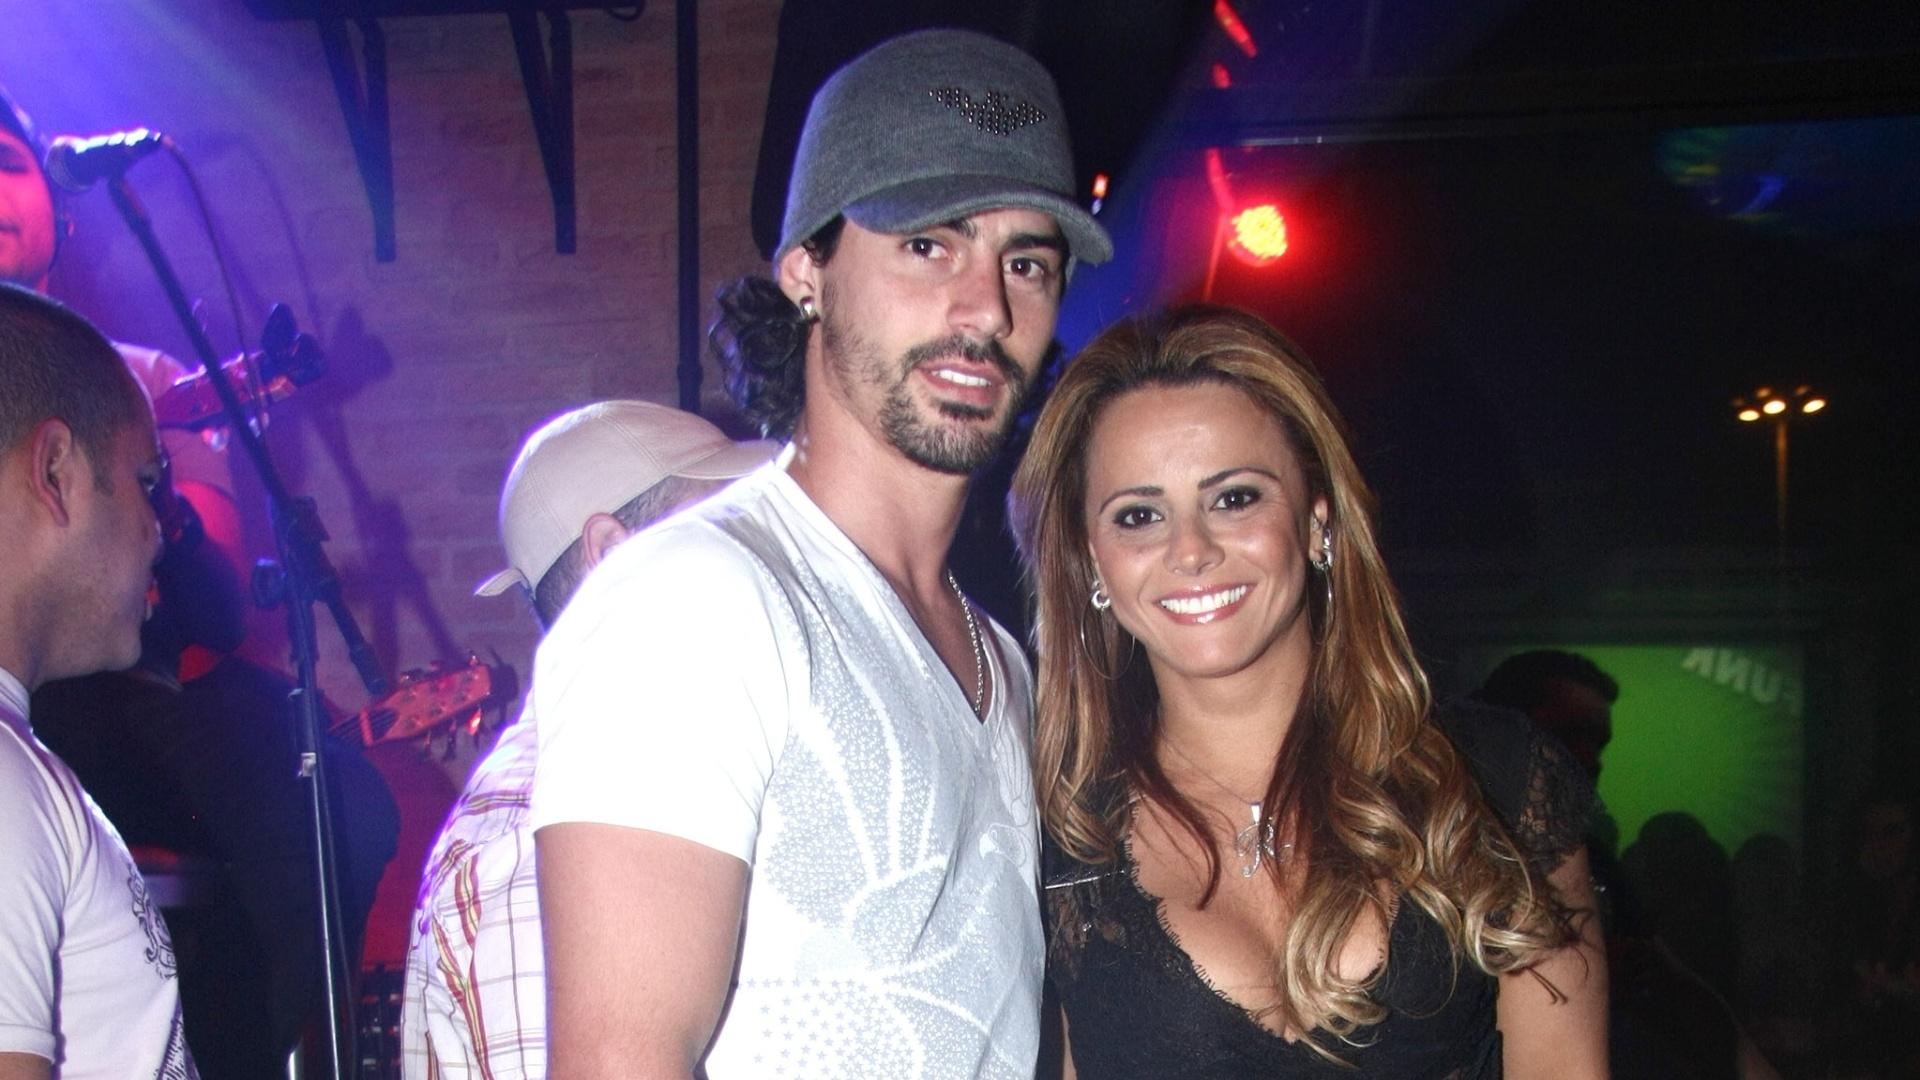 Viviane Araújo posa ao lado do noivo, o jogador do Boa Esporte Radamés Martins. O relacionamento com o jogador teria sido o estopim da rivalidade entre Viviane e Nicole Bahls no confinamento (23/06/2009)